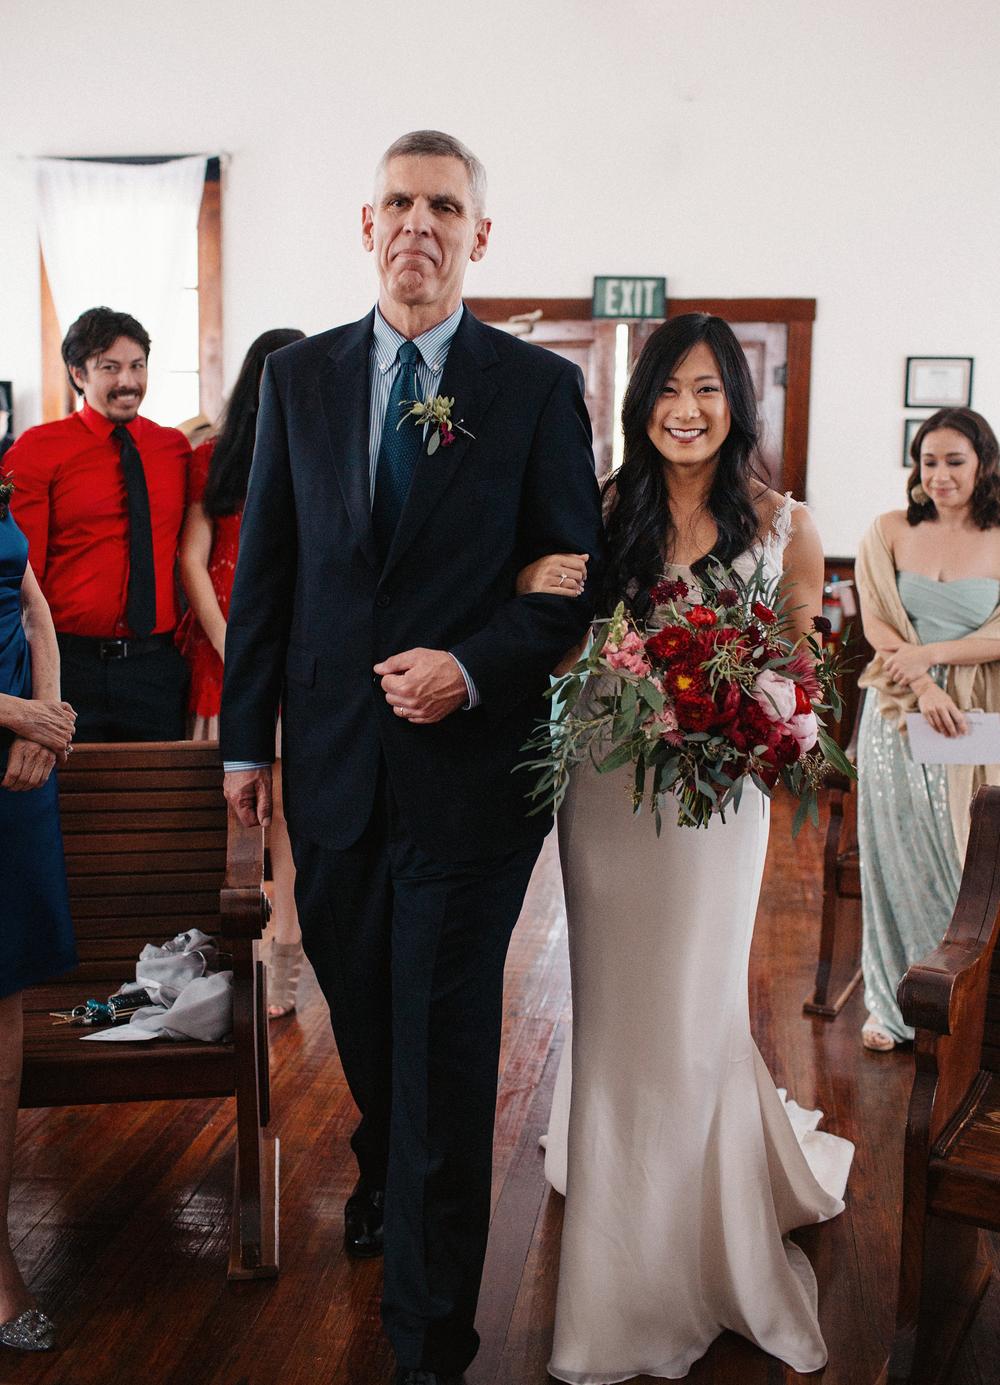 Wedding Day | Vanessa Boy Photography | vanessaboy.com-156.com final.jpg